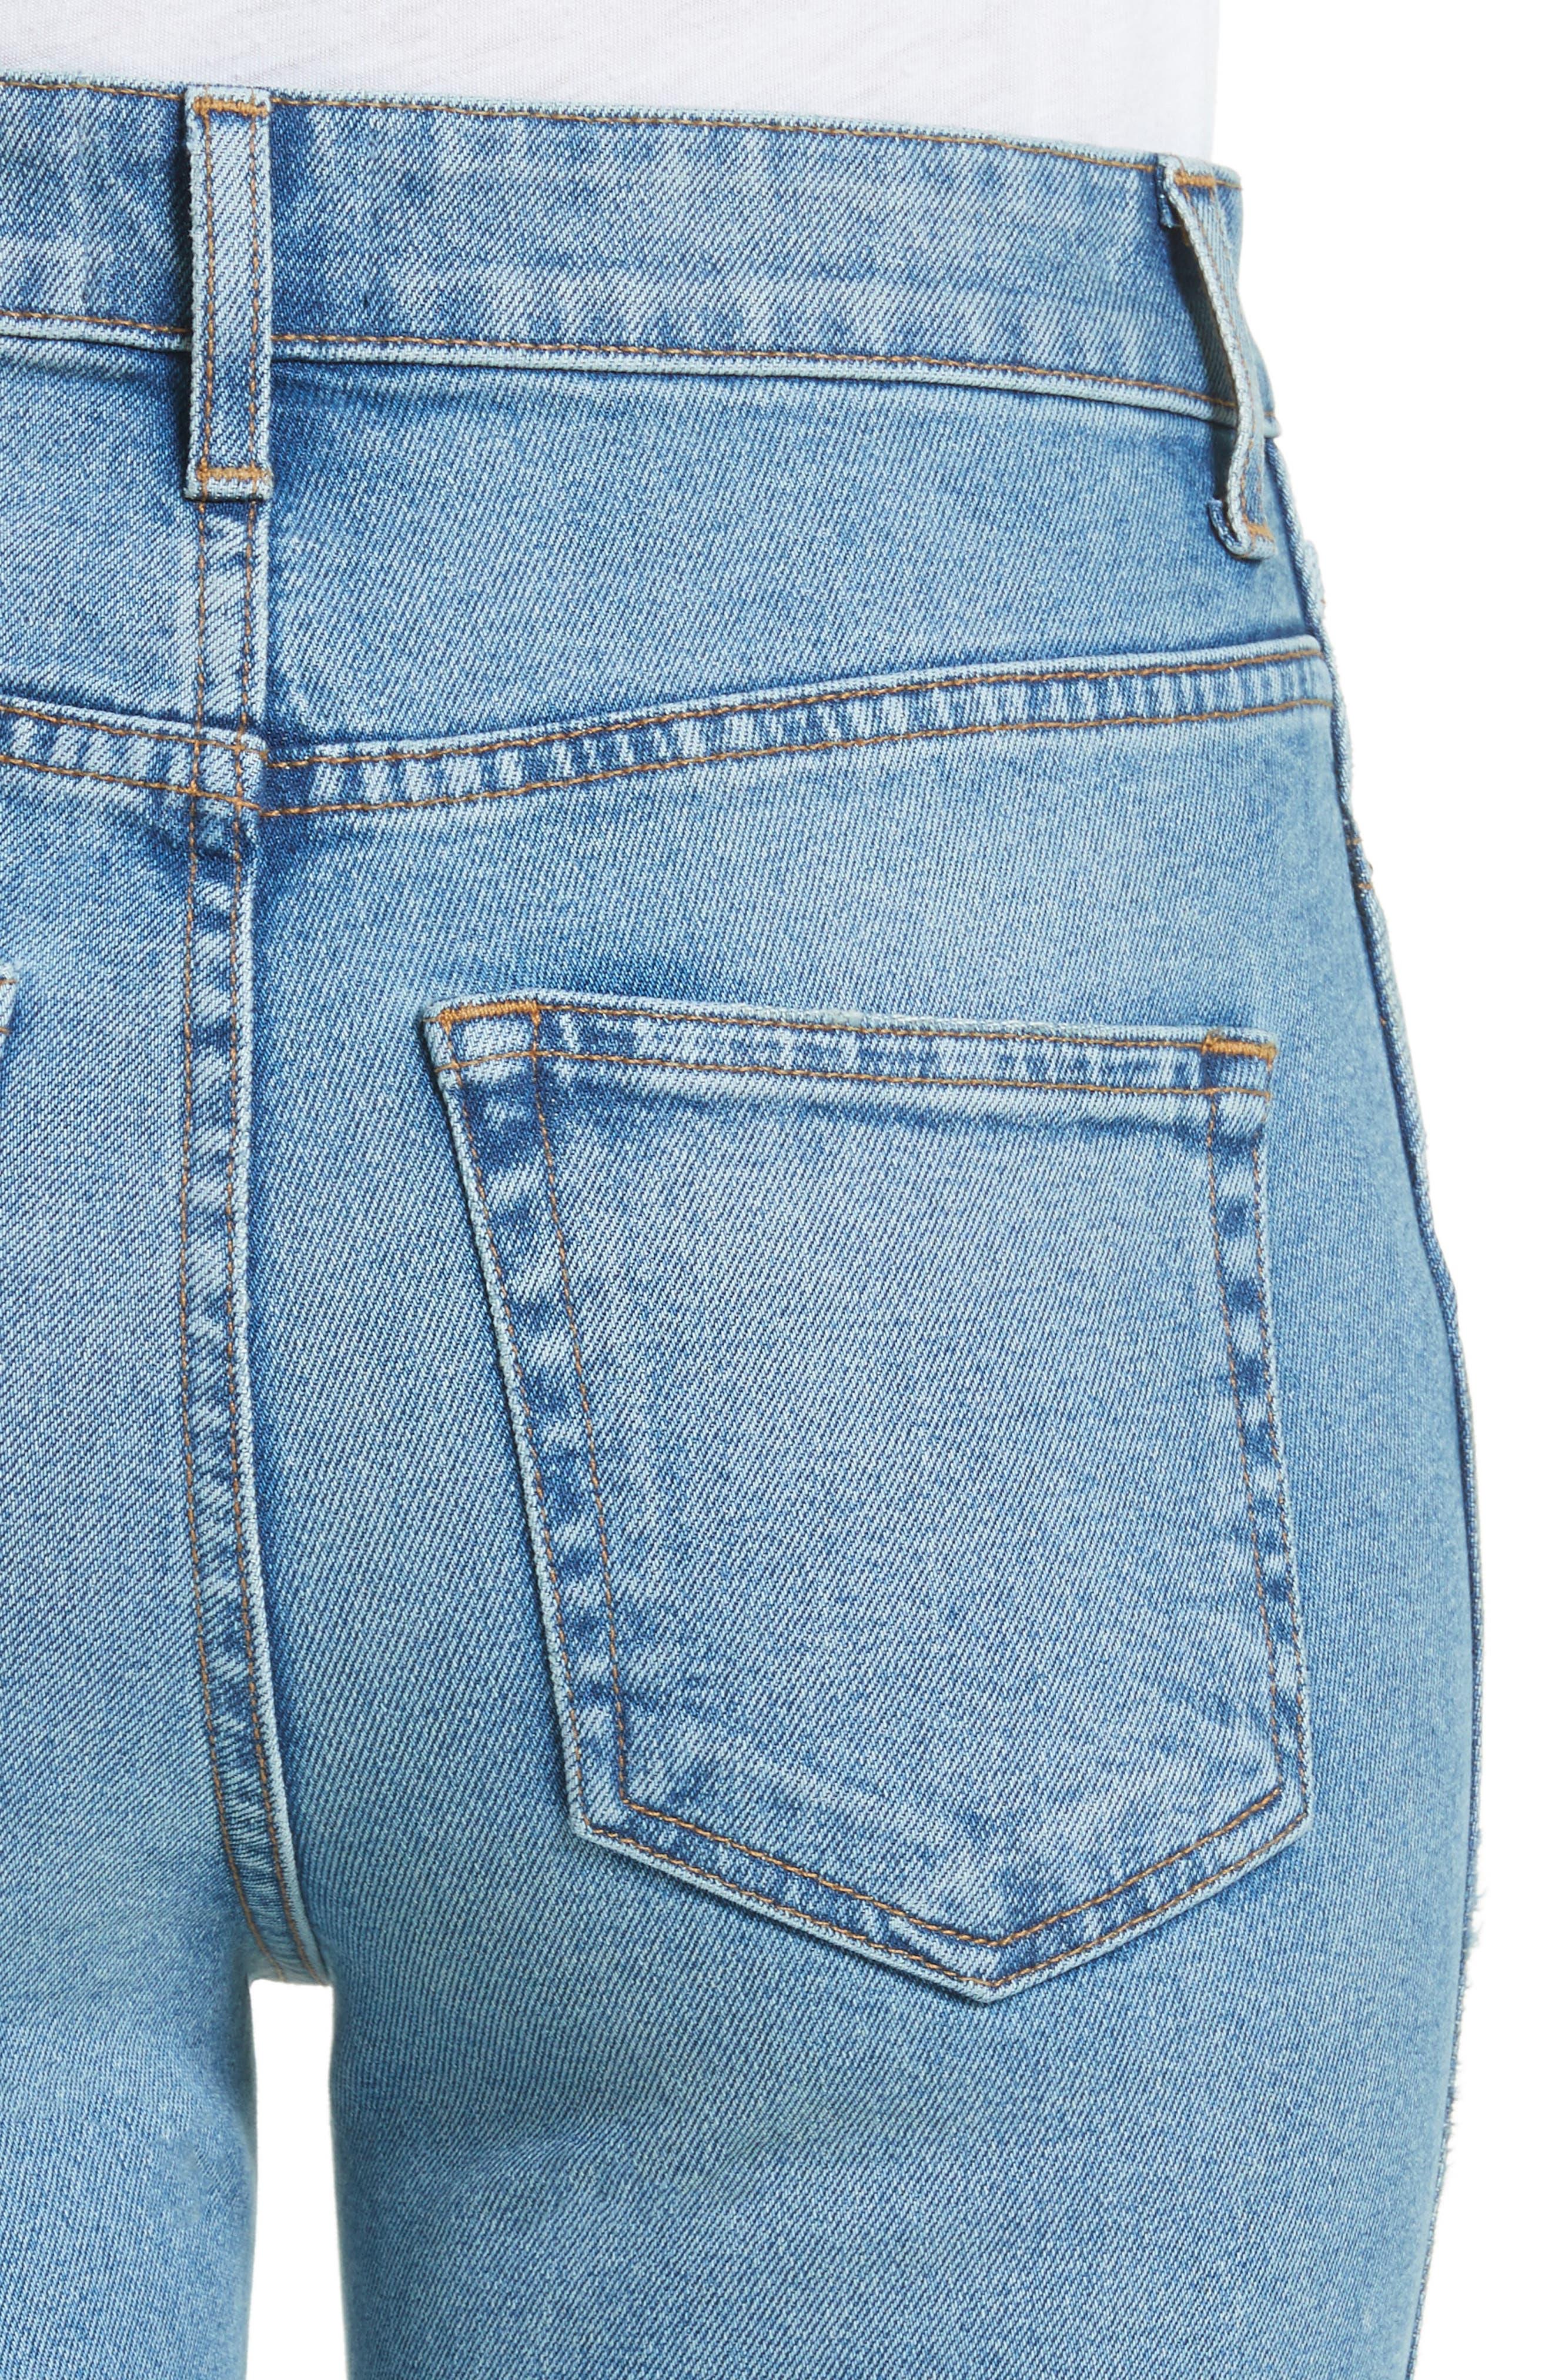 Victoria Straight Leg Jeans,                             Alternate thumbnail 6, color,                             Medium Crease